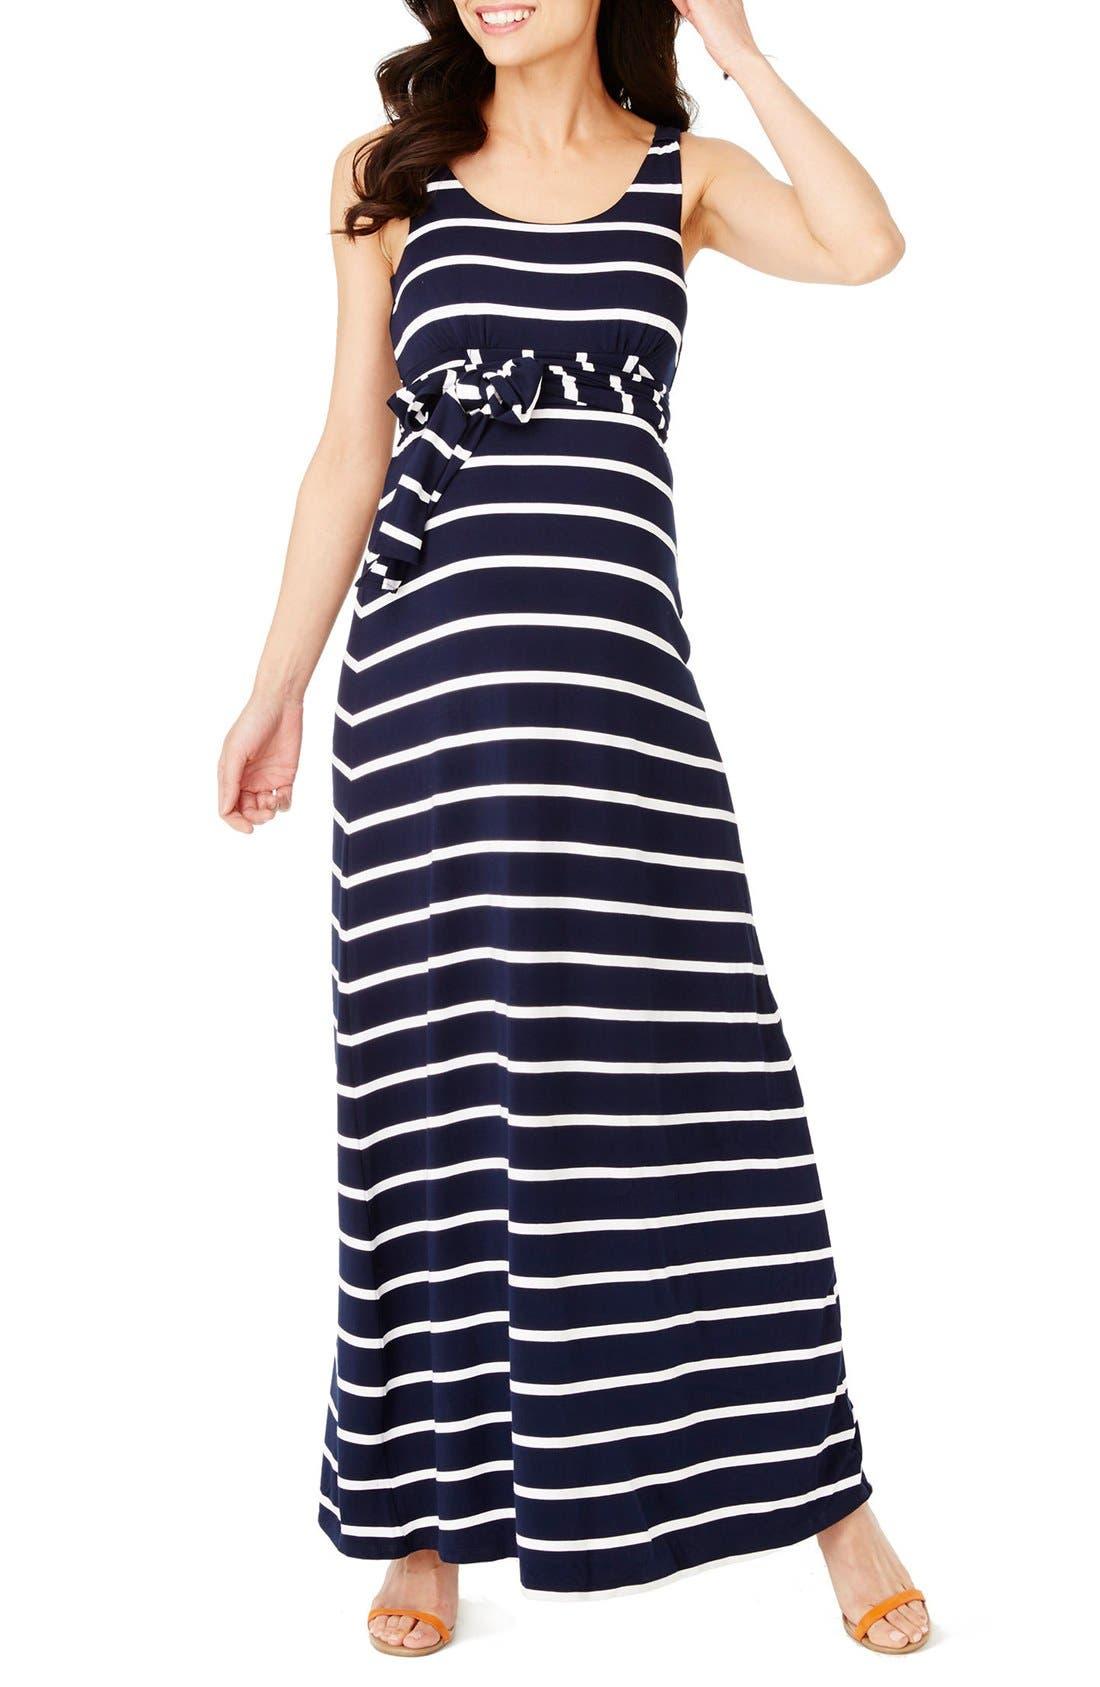 'Kendal' Stripe Maternity Maxi Dress,                             Main thumbnail 1, color,                             Navy White Stripe